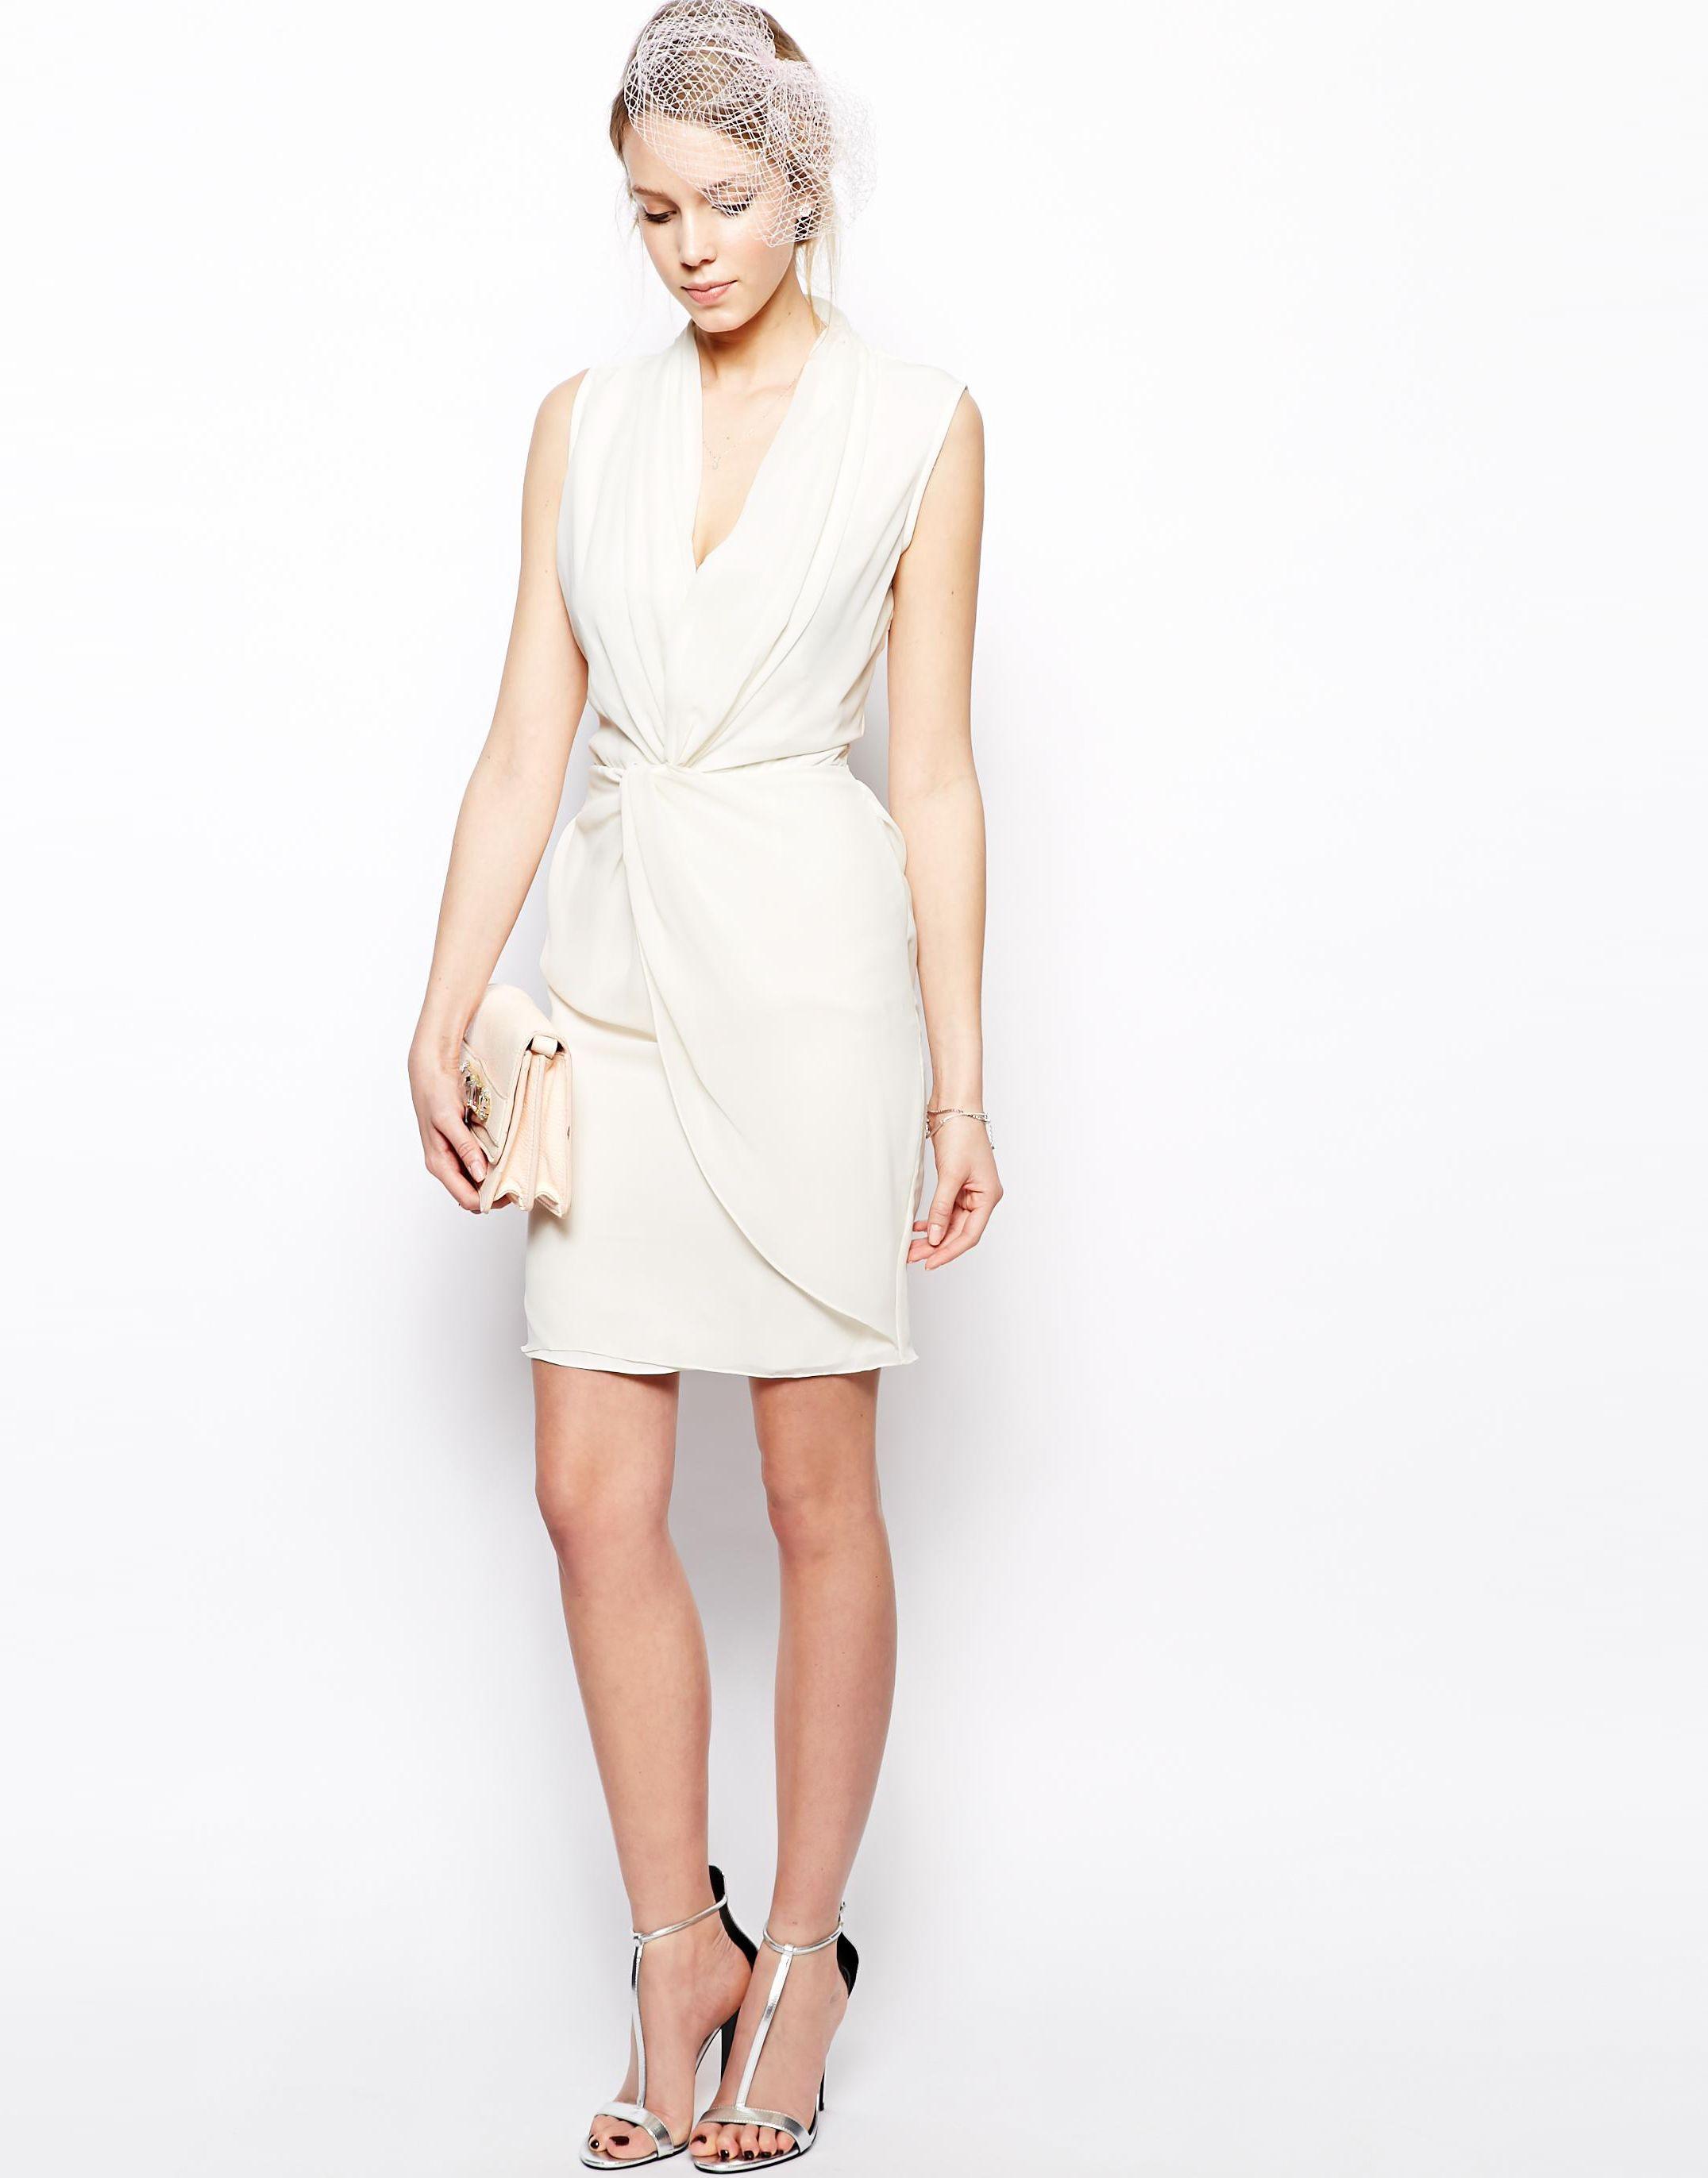 Asos Vlabel London Somerset Tuxedo Dress With Wrap Front 4149329 Gosia Guzowska Dresses Tuxedo Dress Fashion [ 2743 x 2151 Pixel ]